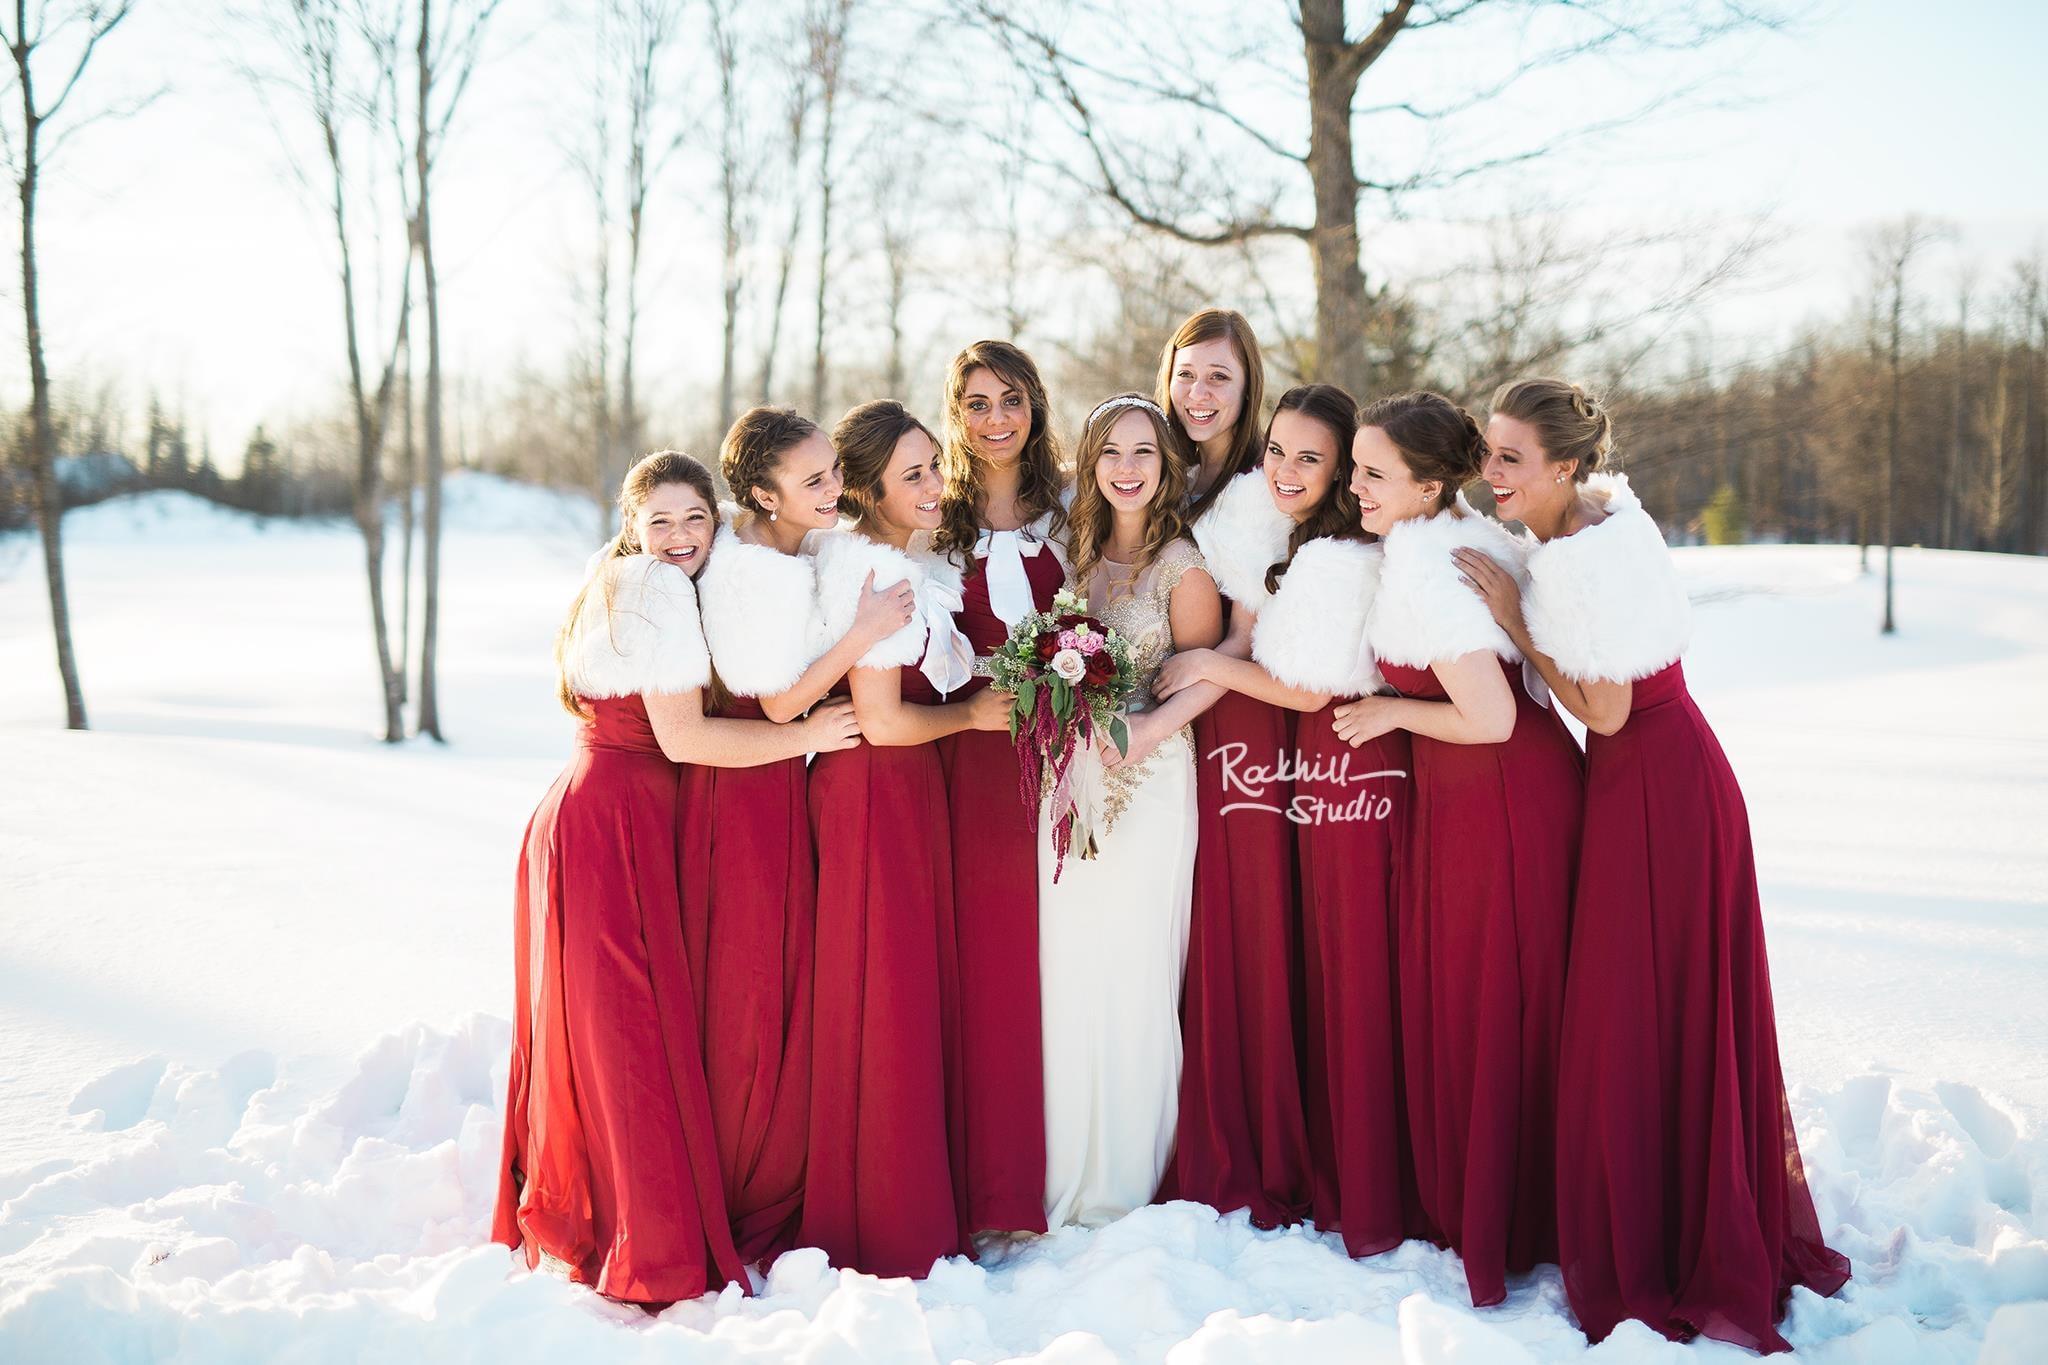 Rockhill-Studio-Wedding-Photographer-Winter-Michigan-Upper-Peninsula-Mackinac-Island-Marquette-Newberry-Escanaba-Houghton.jpg